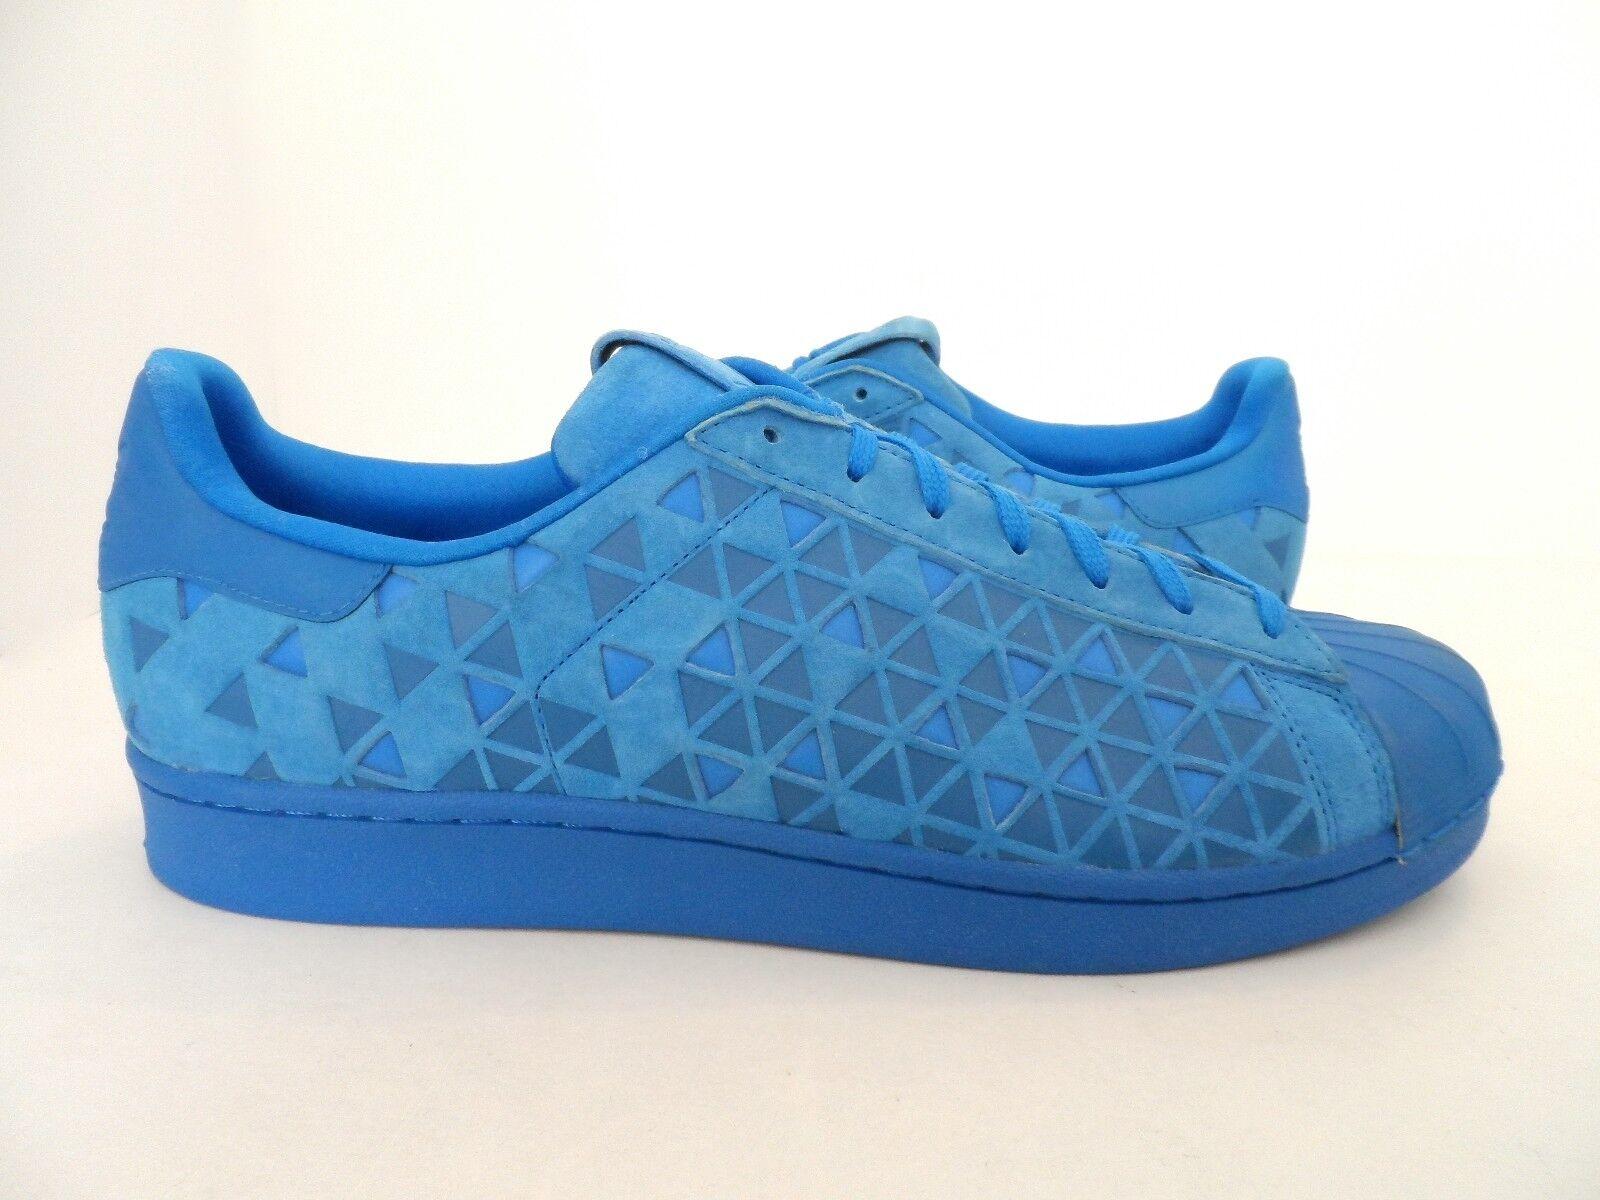 reputable site ab7cc f8a52 Adidas Originals Superstar Xeno reflectante reflectante reflectante hombres  zapatos azul comodo barato y hermoso moda 4f4820